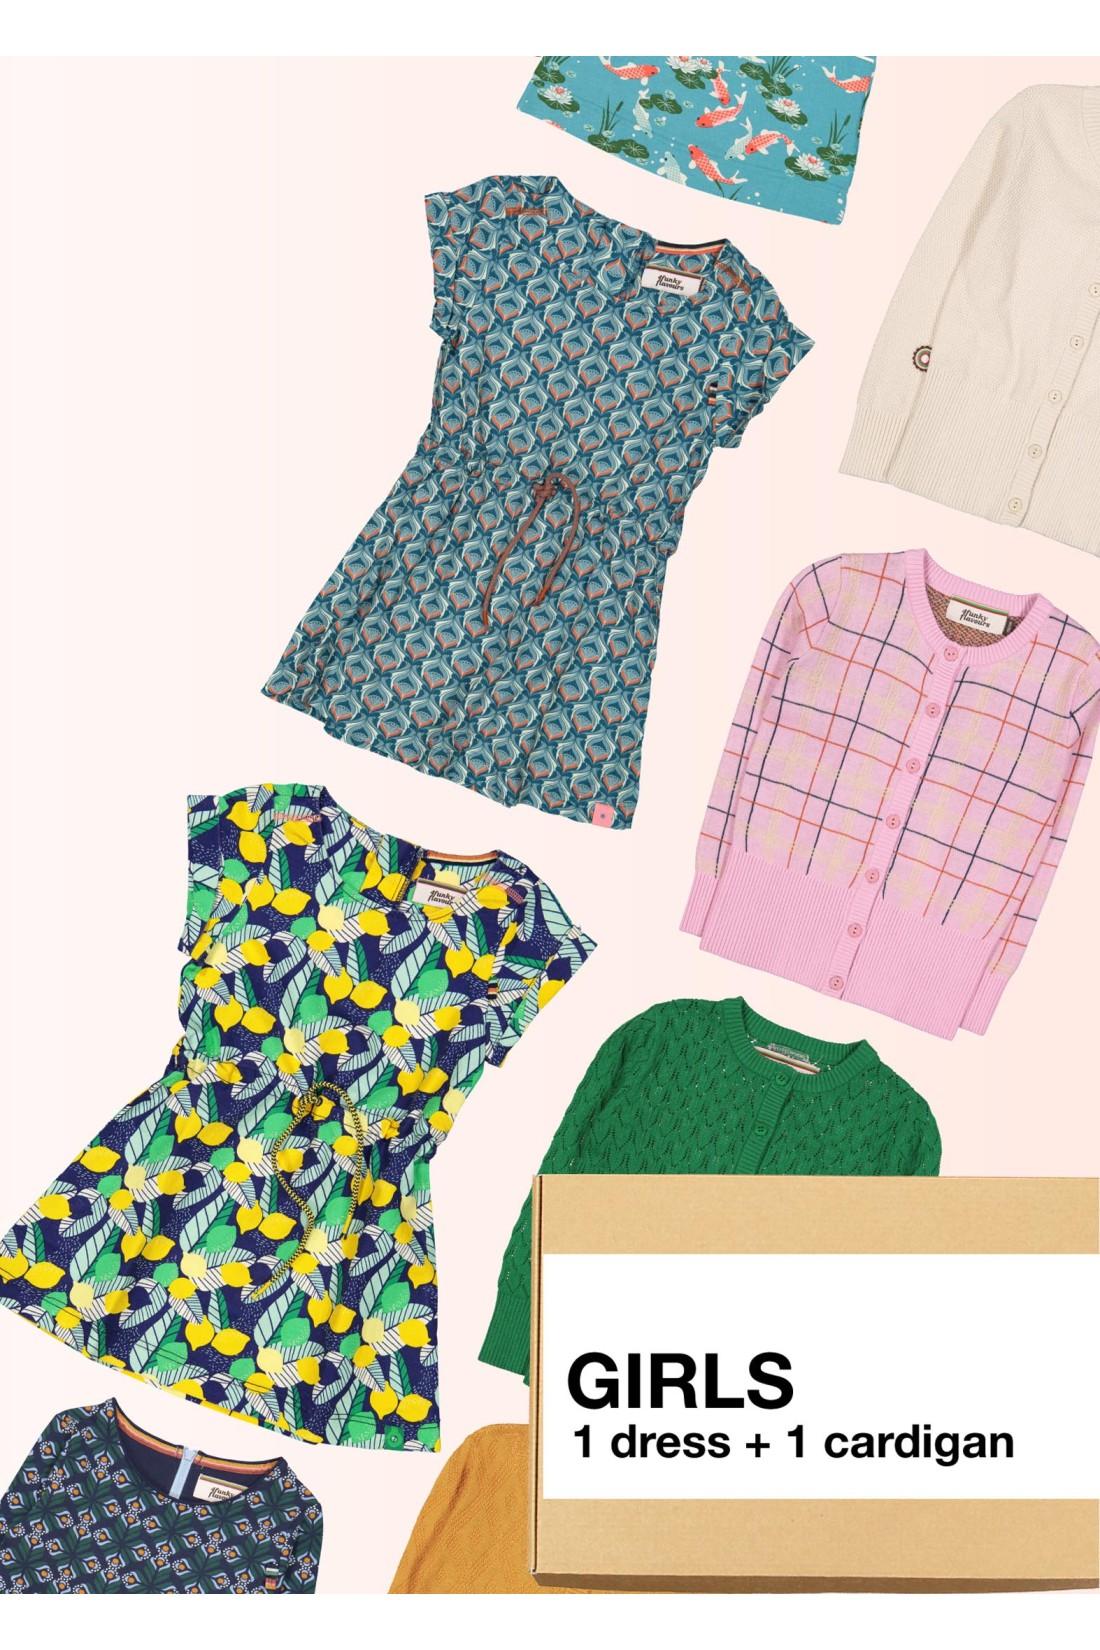 Surprise Box Girl - Dress + Cardigan